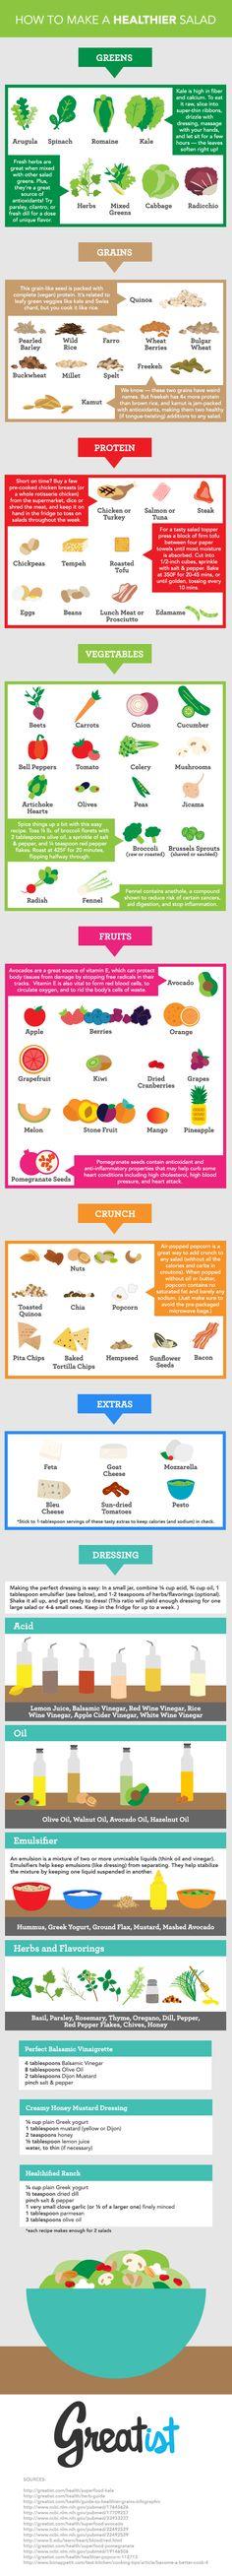 How to Make a Health